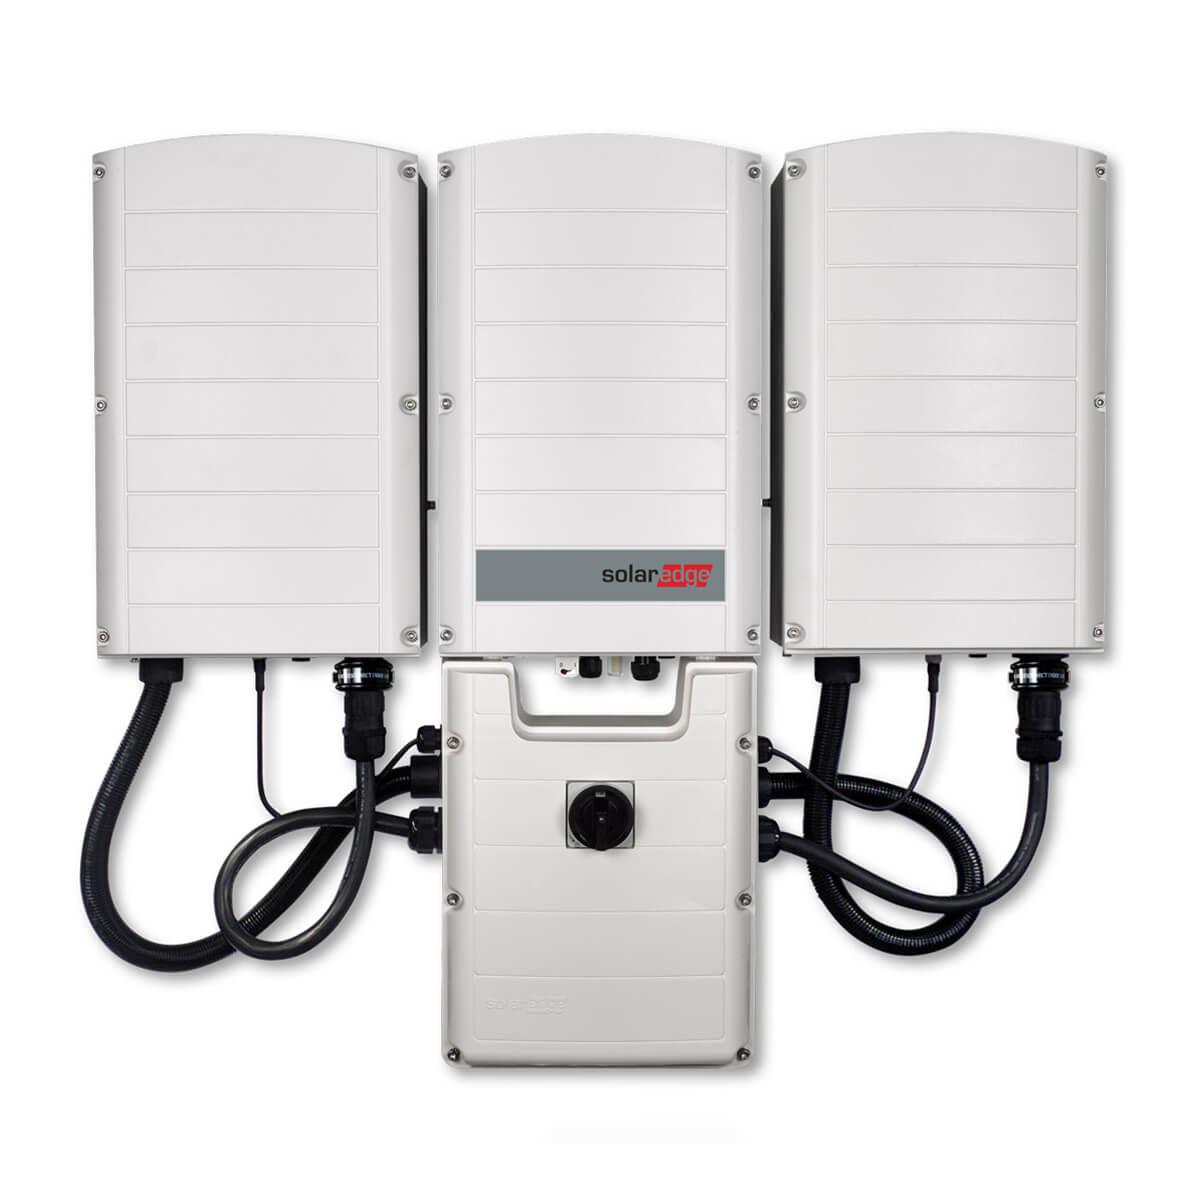 solaredge 55kW inverter, solaredge se55k 55kW inverter, solaredge se55k inverter, solaredge se55k, solaredge 55 kW